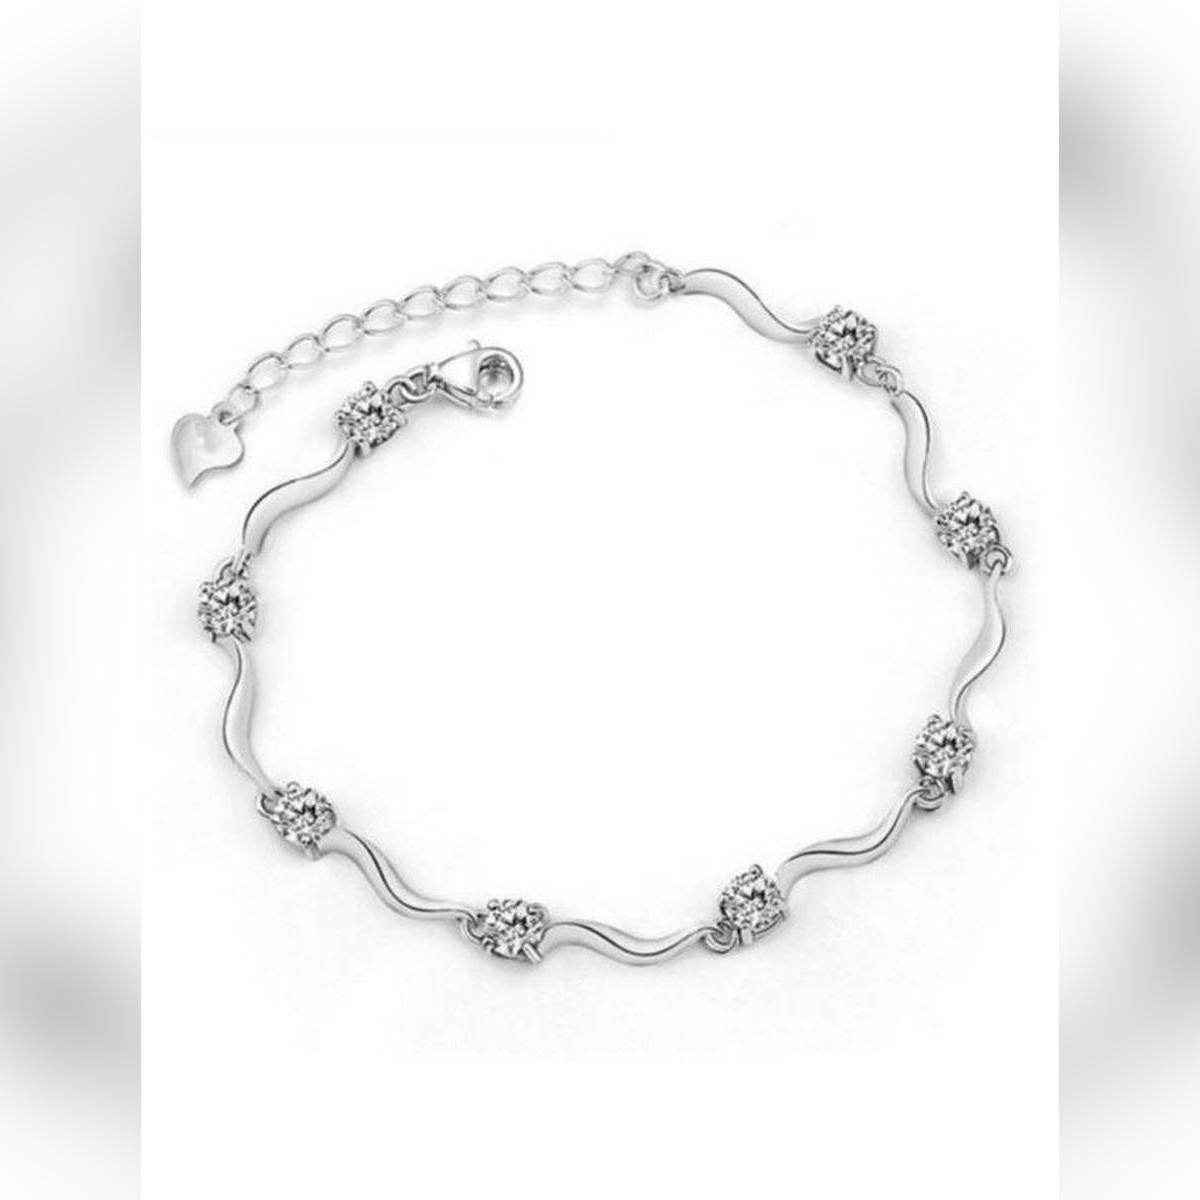 Stylish Luxury Personality Accessories Women Charm Pearl Bangle Bracelet